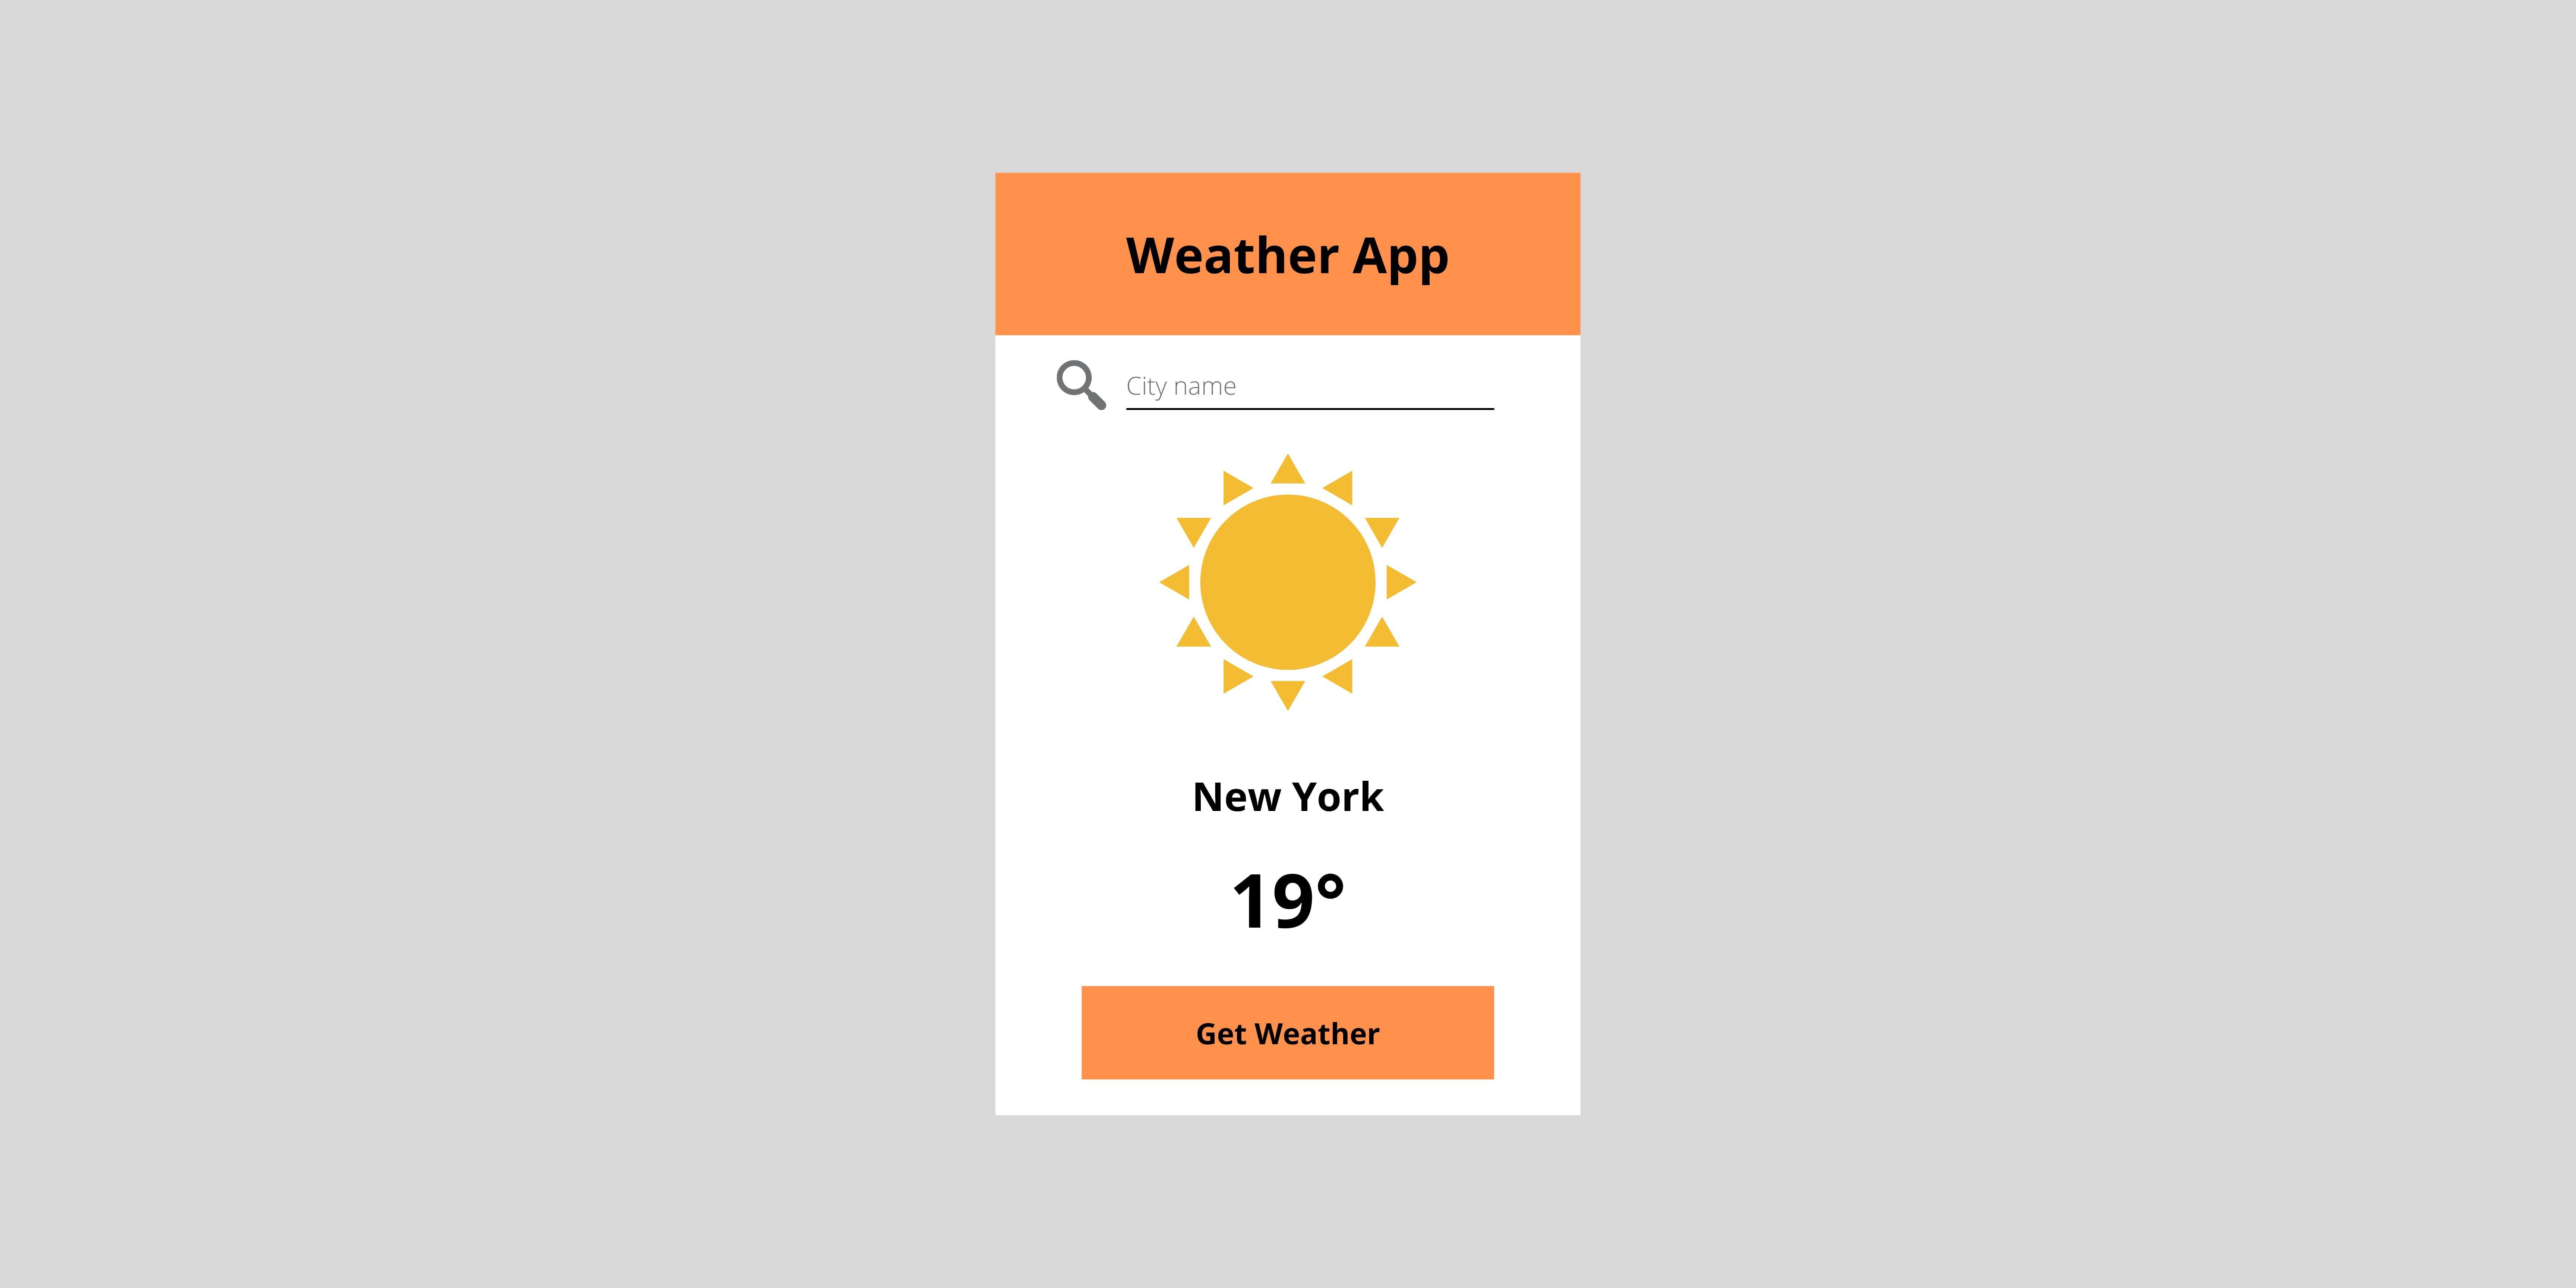 weatherapp.png